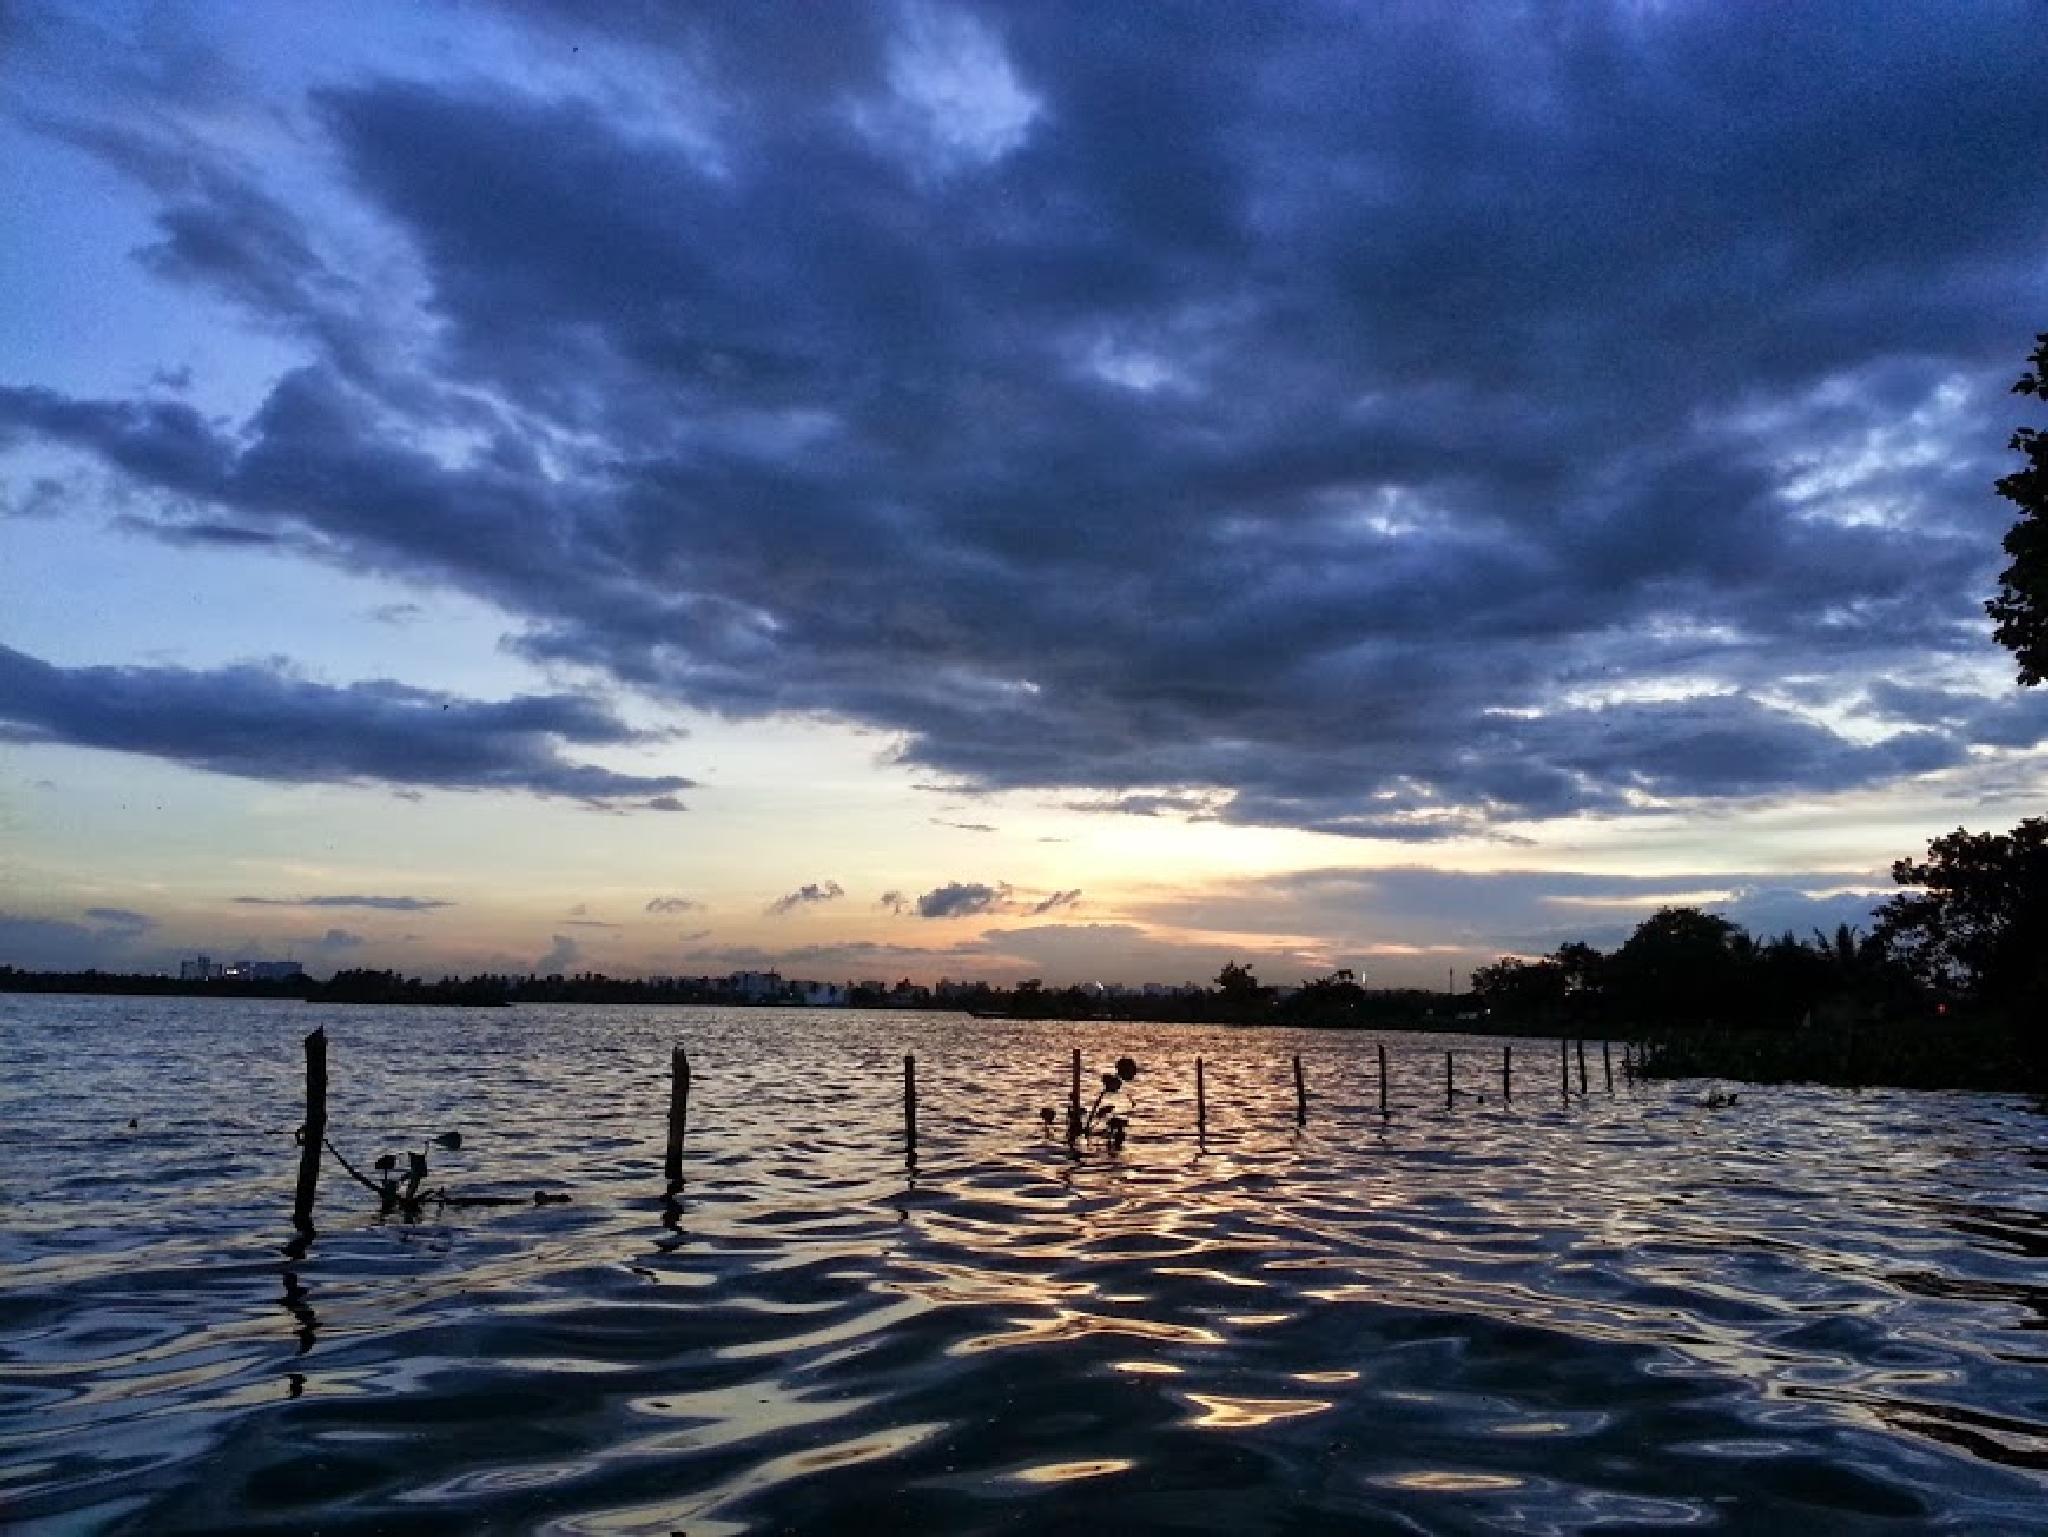 sunset by Arindam Sarkar